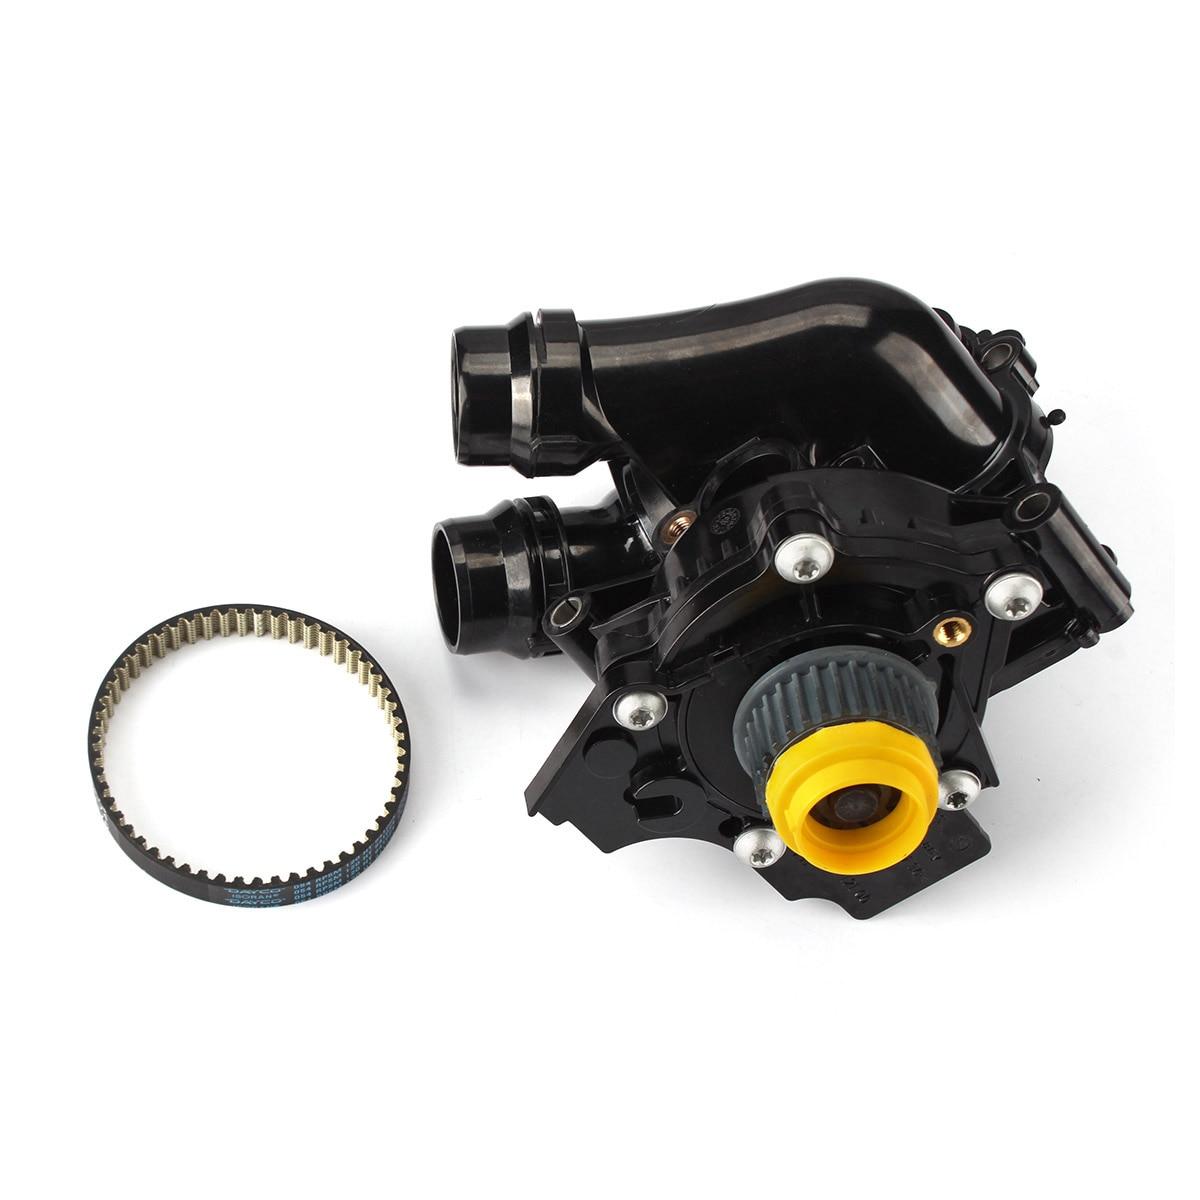 цены на EA888 1.8TFSI 2.0TFSI Engine Water Pump w/ Belt 06H 121 026 For VW Jetta GTI Passat CC AUDI A4 A6 A8 TT Skoda SEAT  в интернет-магазинах